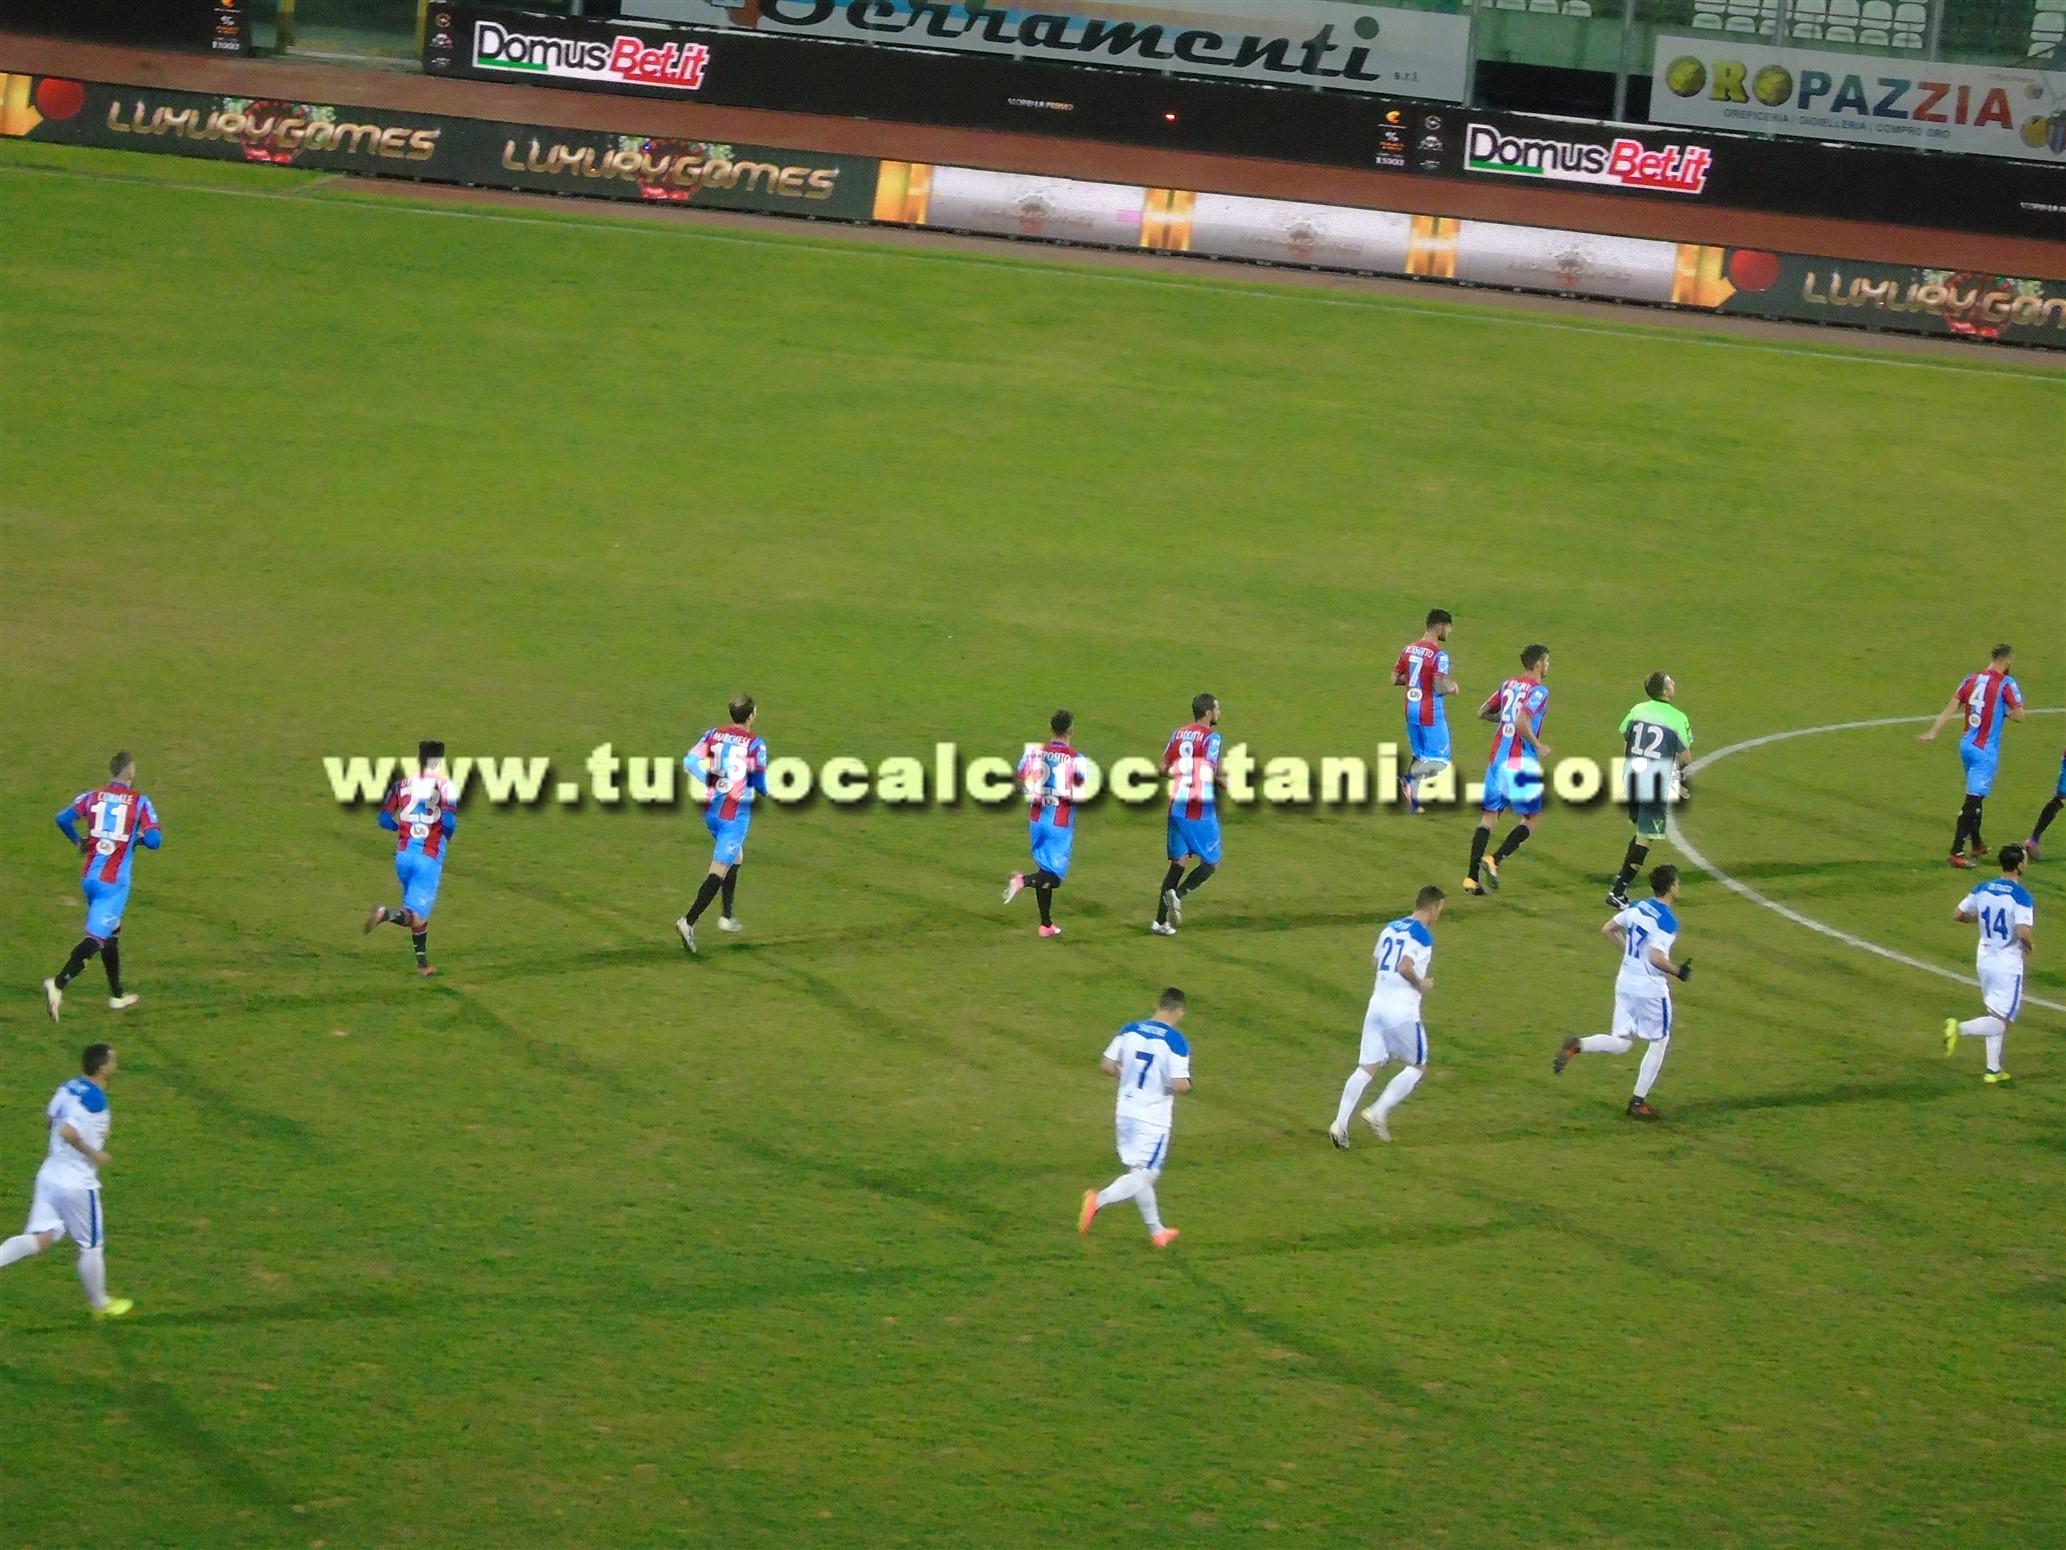 Rende-Catania 0-3: Ripa e Curiale devastanti